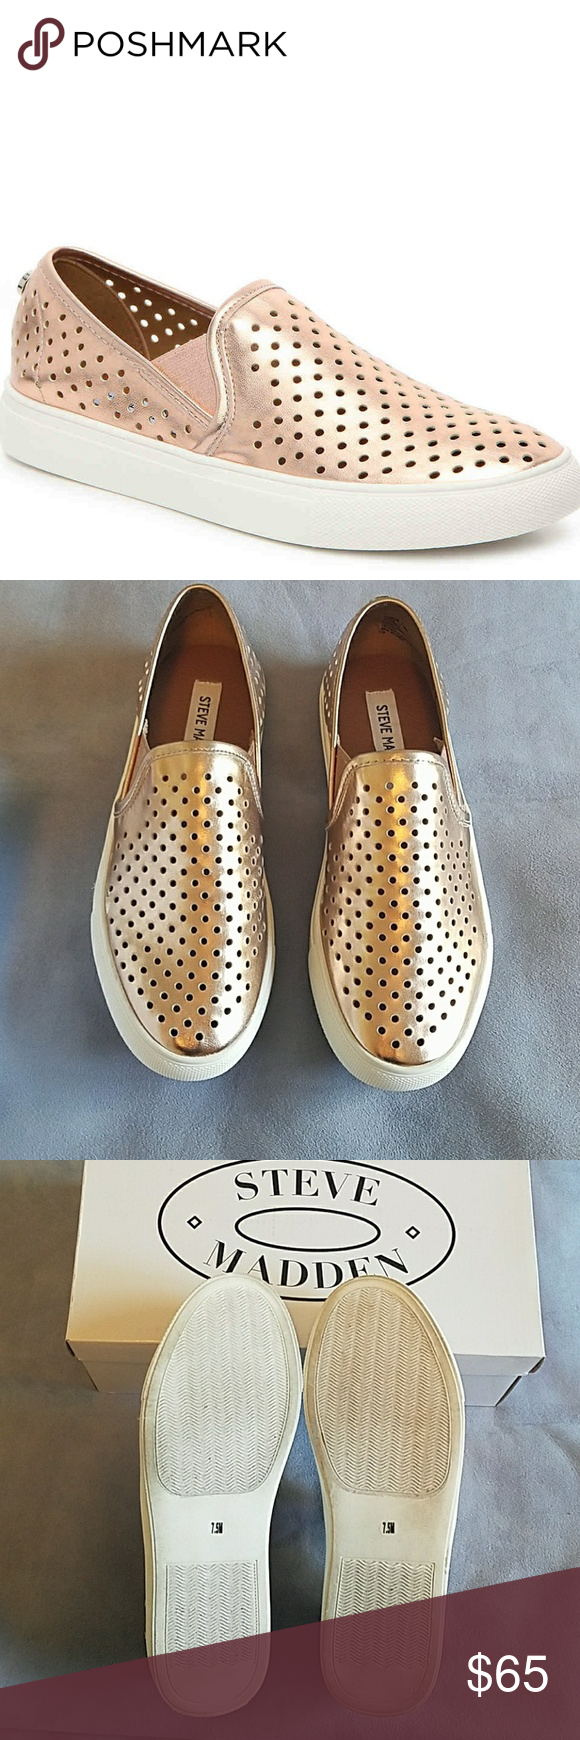 Nwt Steve Madden Owen shoes sz 7.5